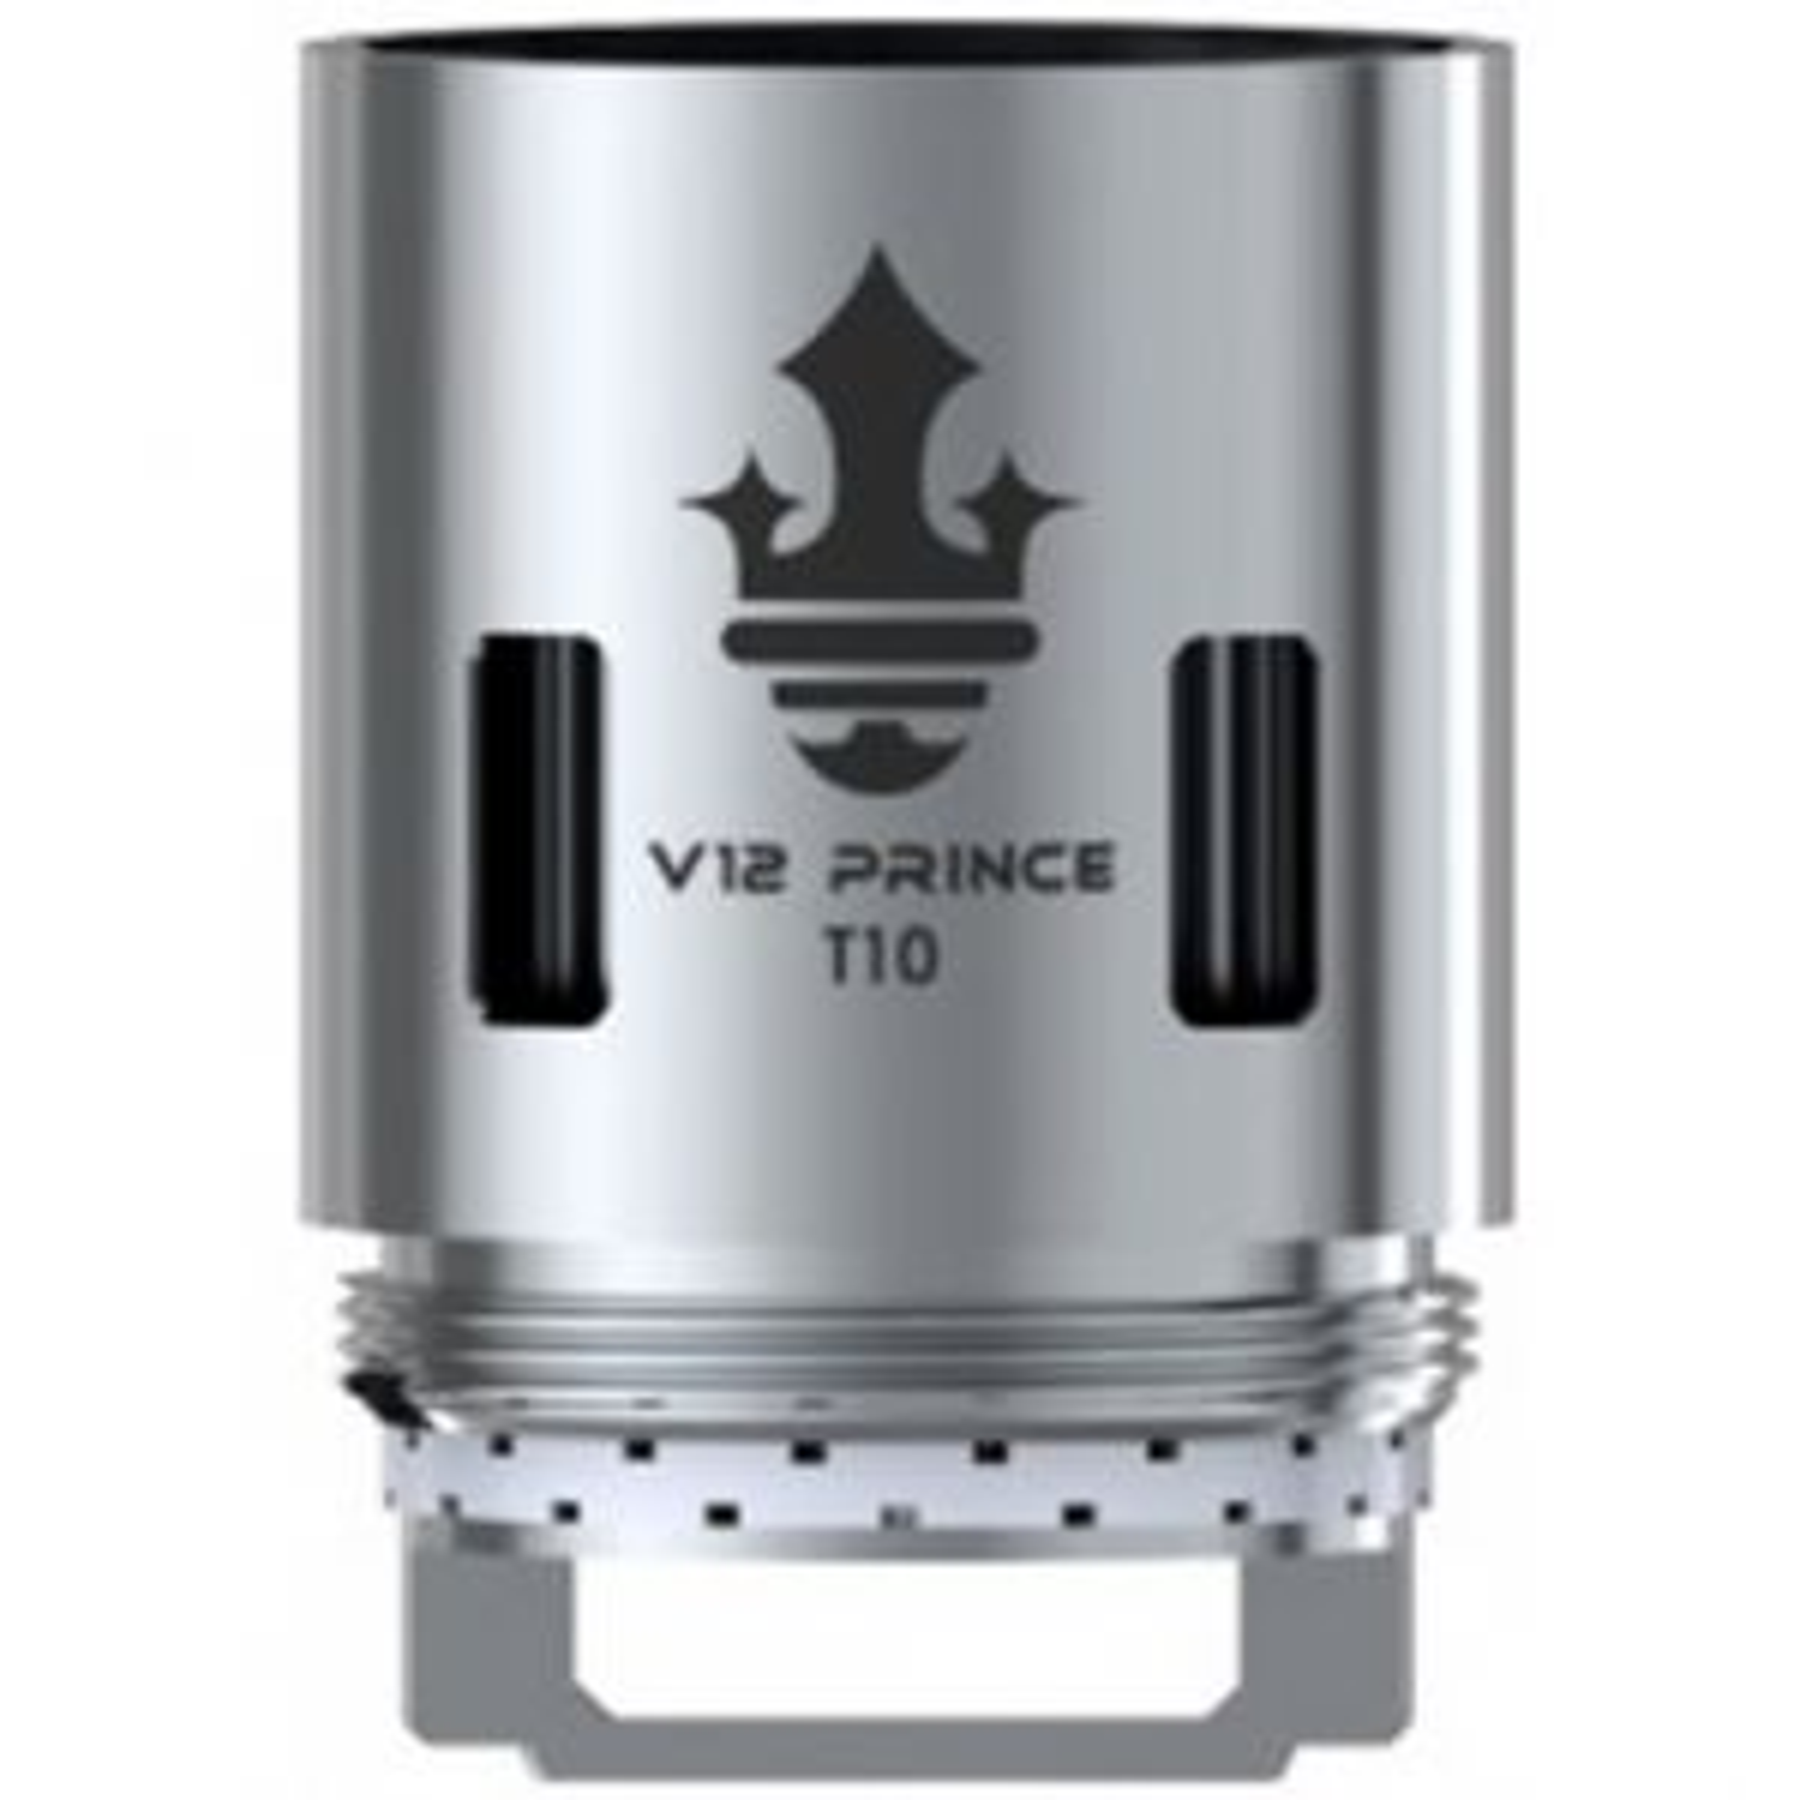 Smok TFV12 PRINCE T10